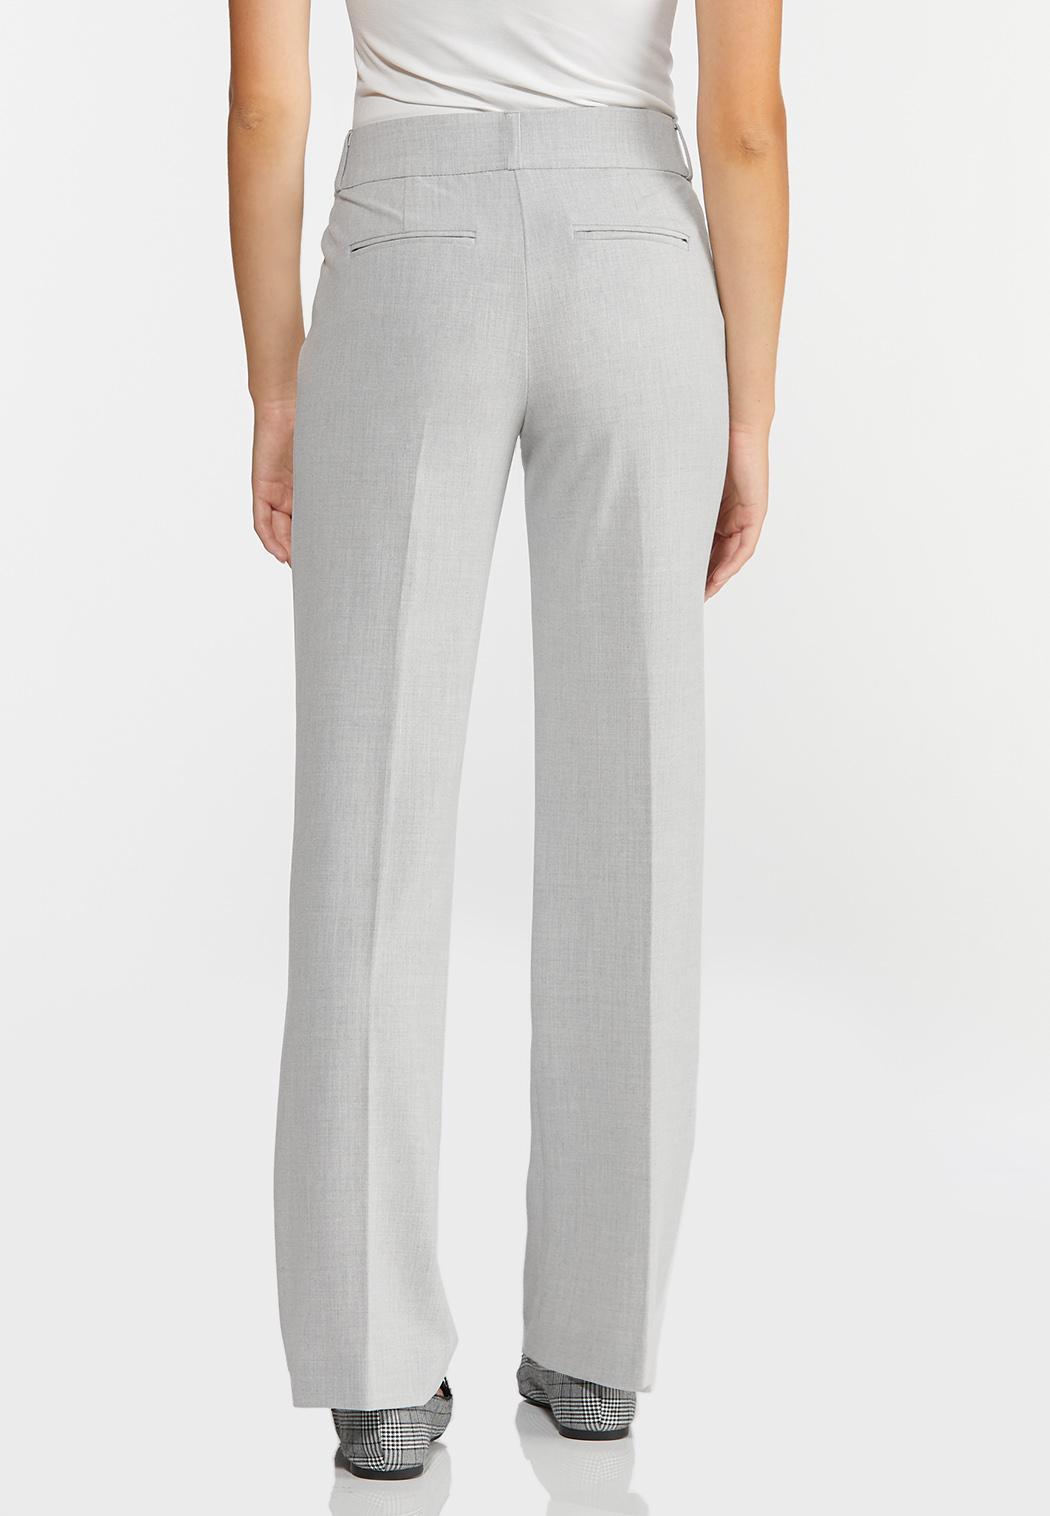 Petite Gray Trouser Pants (Item #44374179)